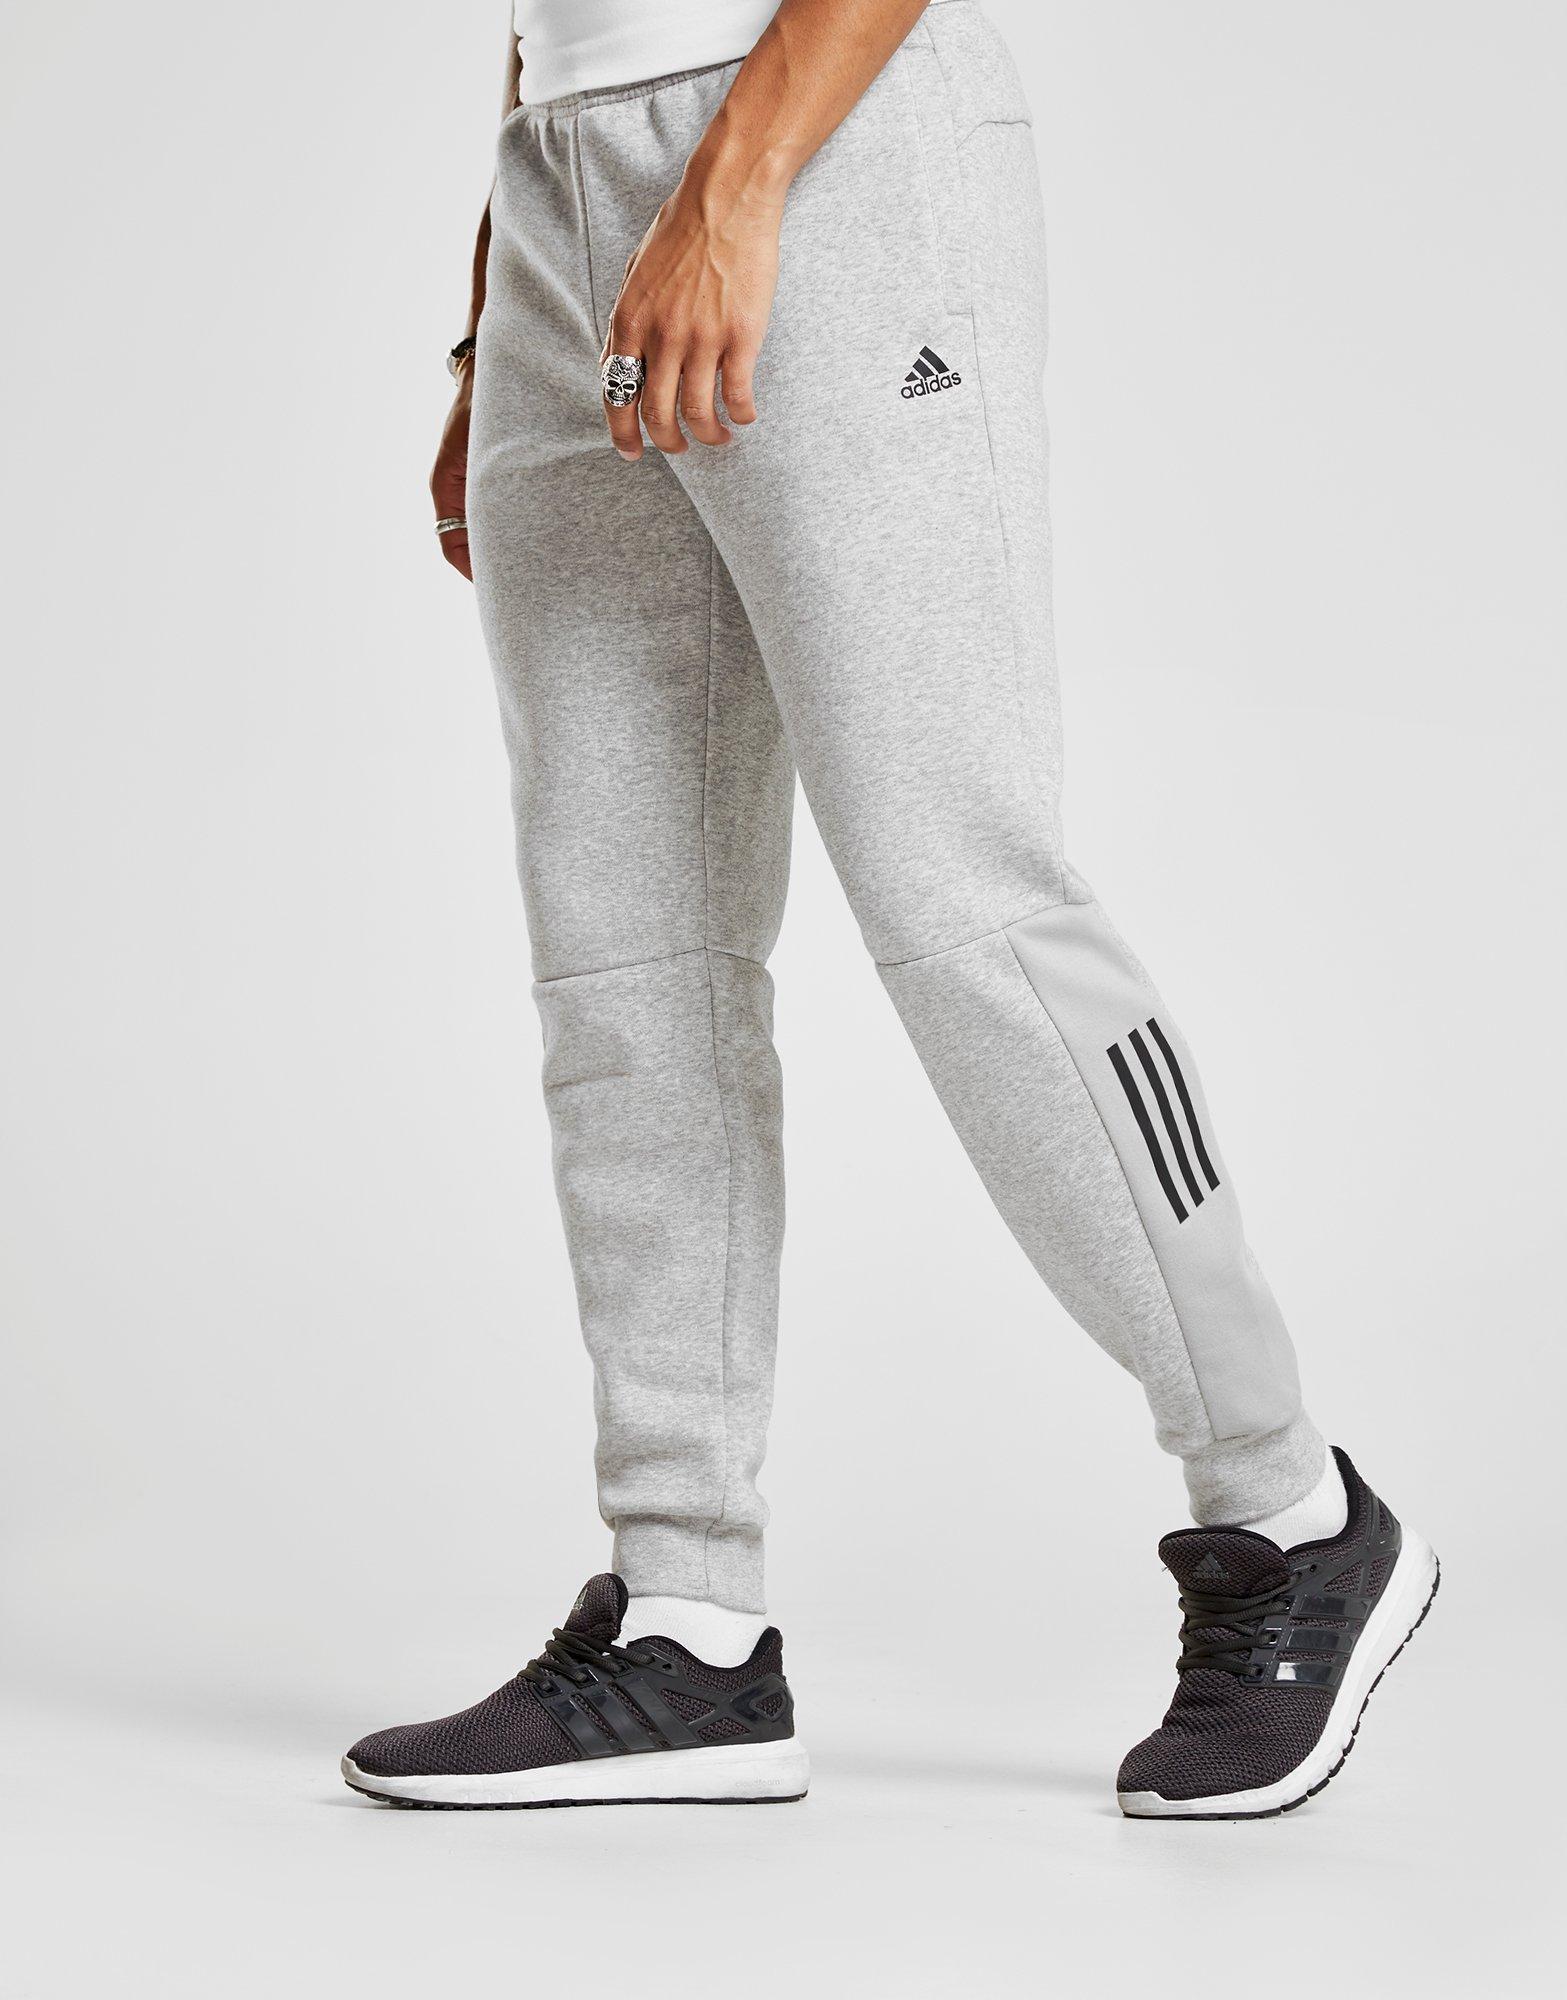 92d902080684 Lyst - adidas Sport Id Fleece Track Pants in Gray for Men